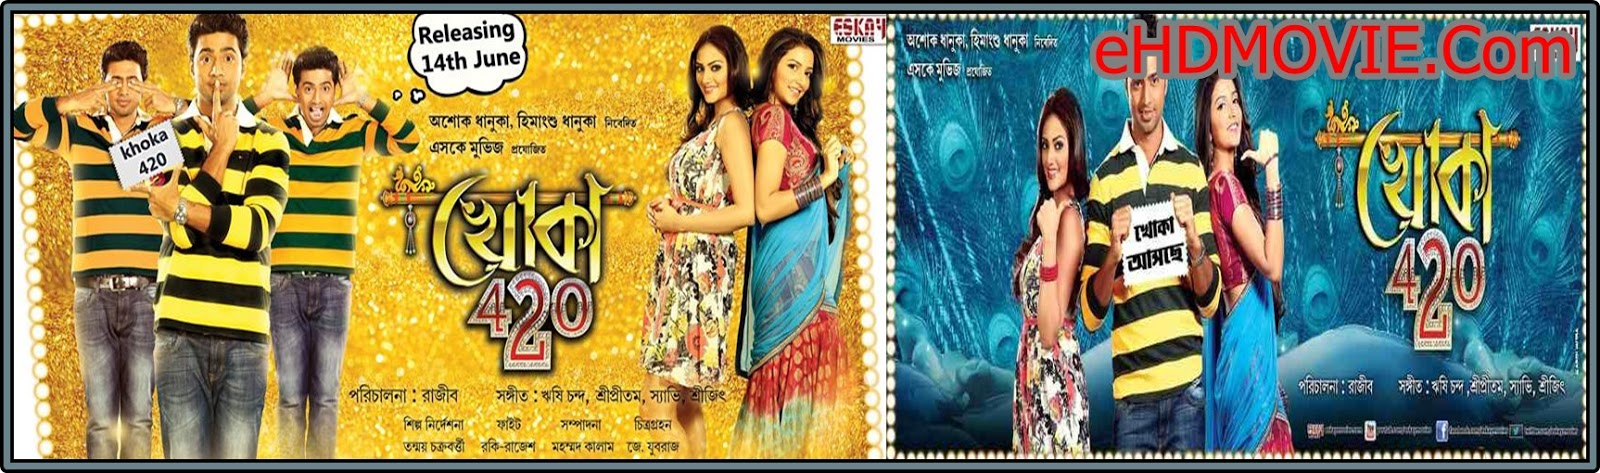 Khoka 420 2013 Bengali Full Movie Original 720p ORG HDTV-Rip 1.2GB